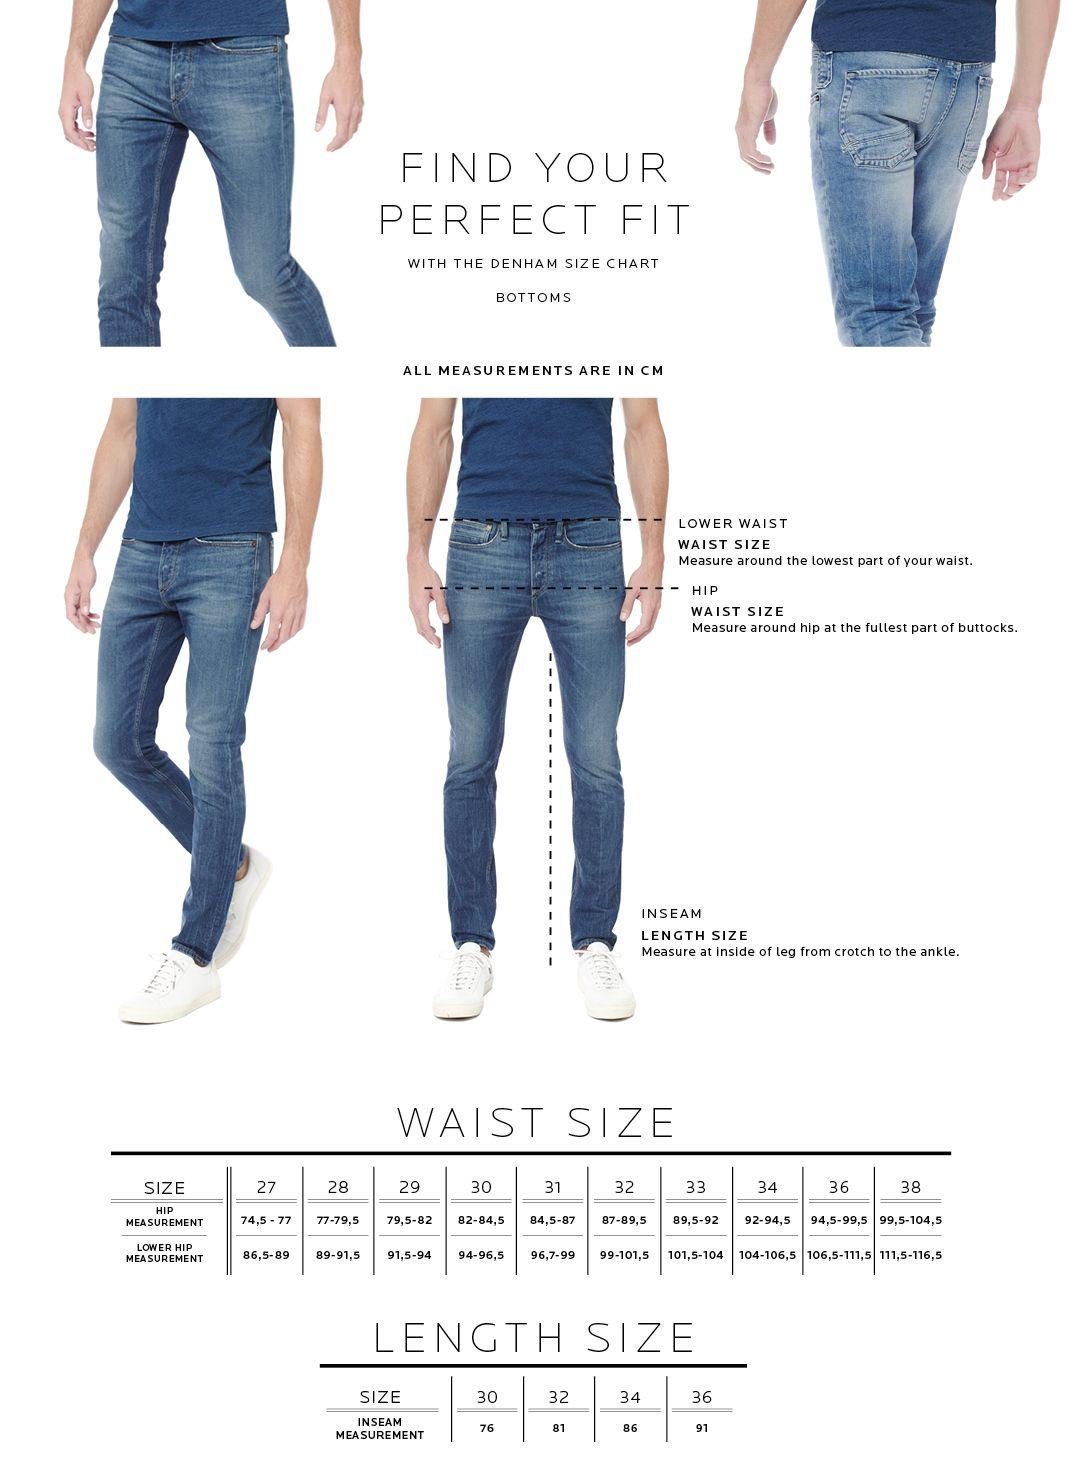 Size Chart Men's Bottoms - Fit Guide - DENHAM the Jeanmaker